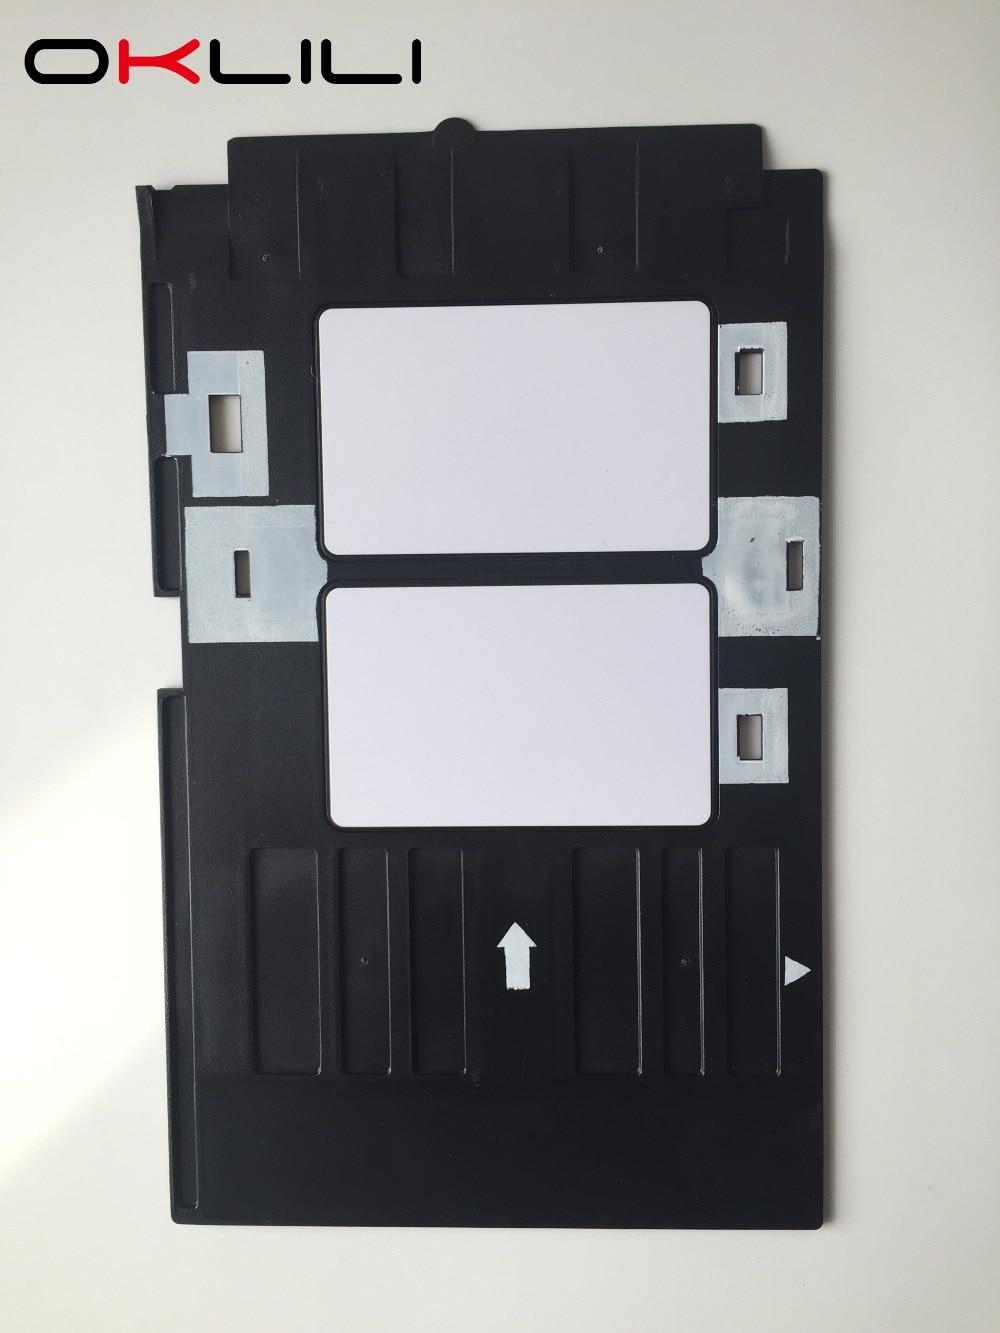 מגש כרטיס זיהוי PVC כרטיס פלסטיק מגש הדפסה עבור Epson R260 R265 R270 R280 R290 R380 R390 RX680 T50 T60 A50 P50 L800 L801 R330